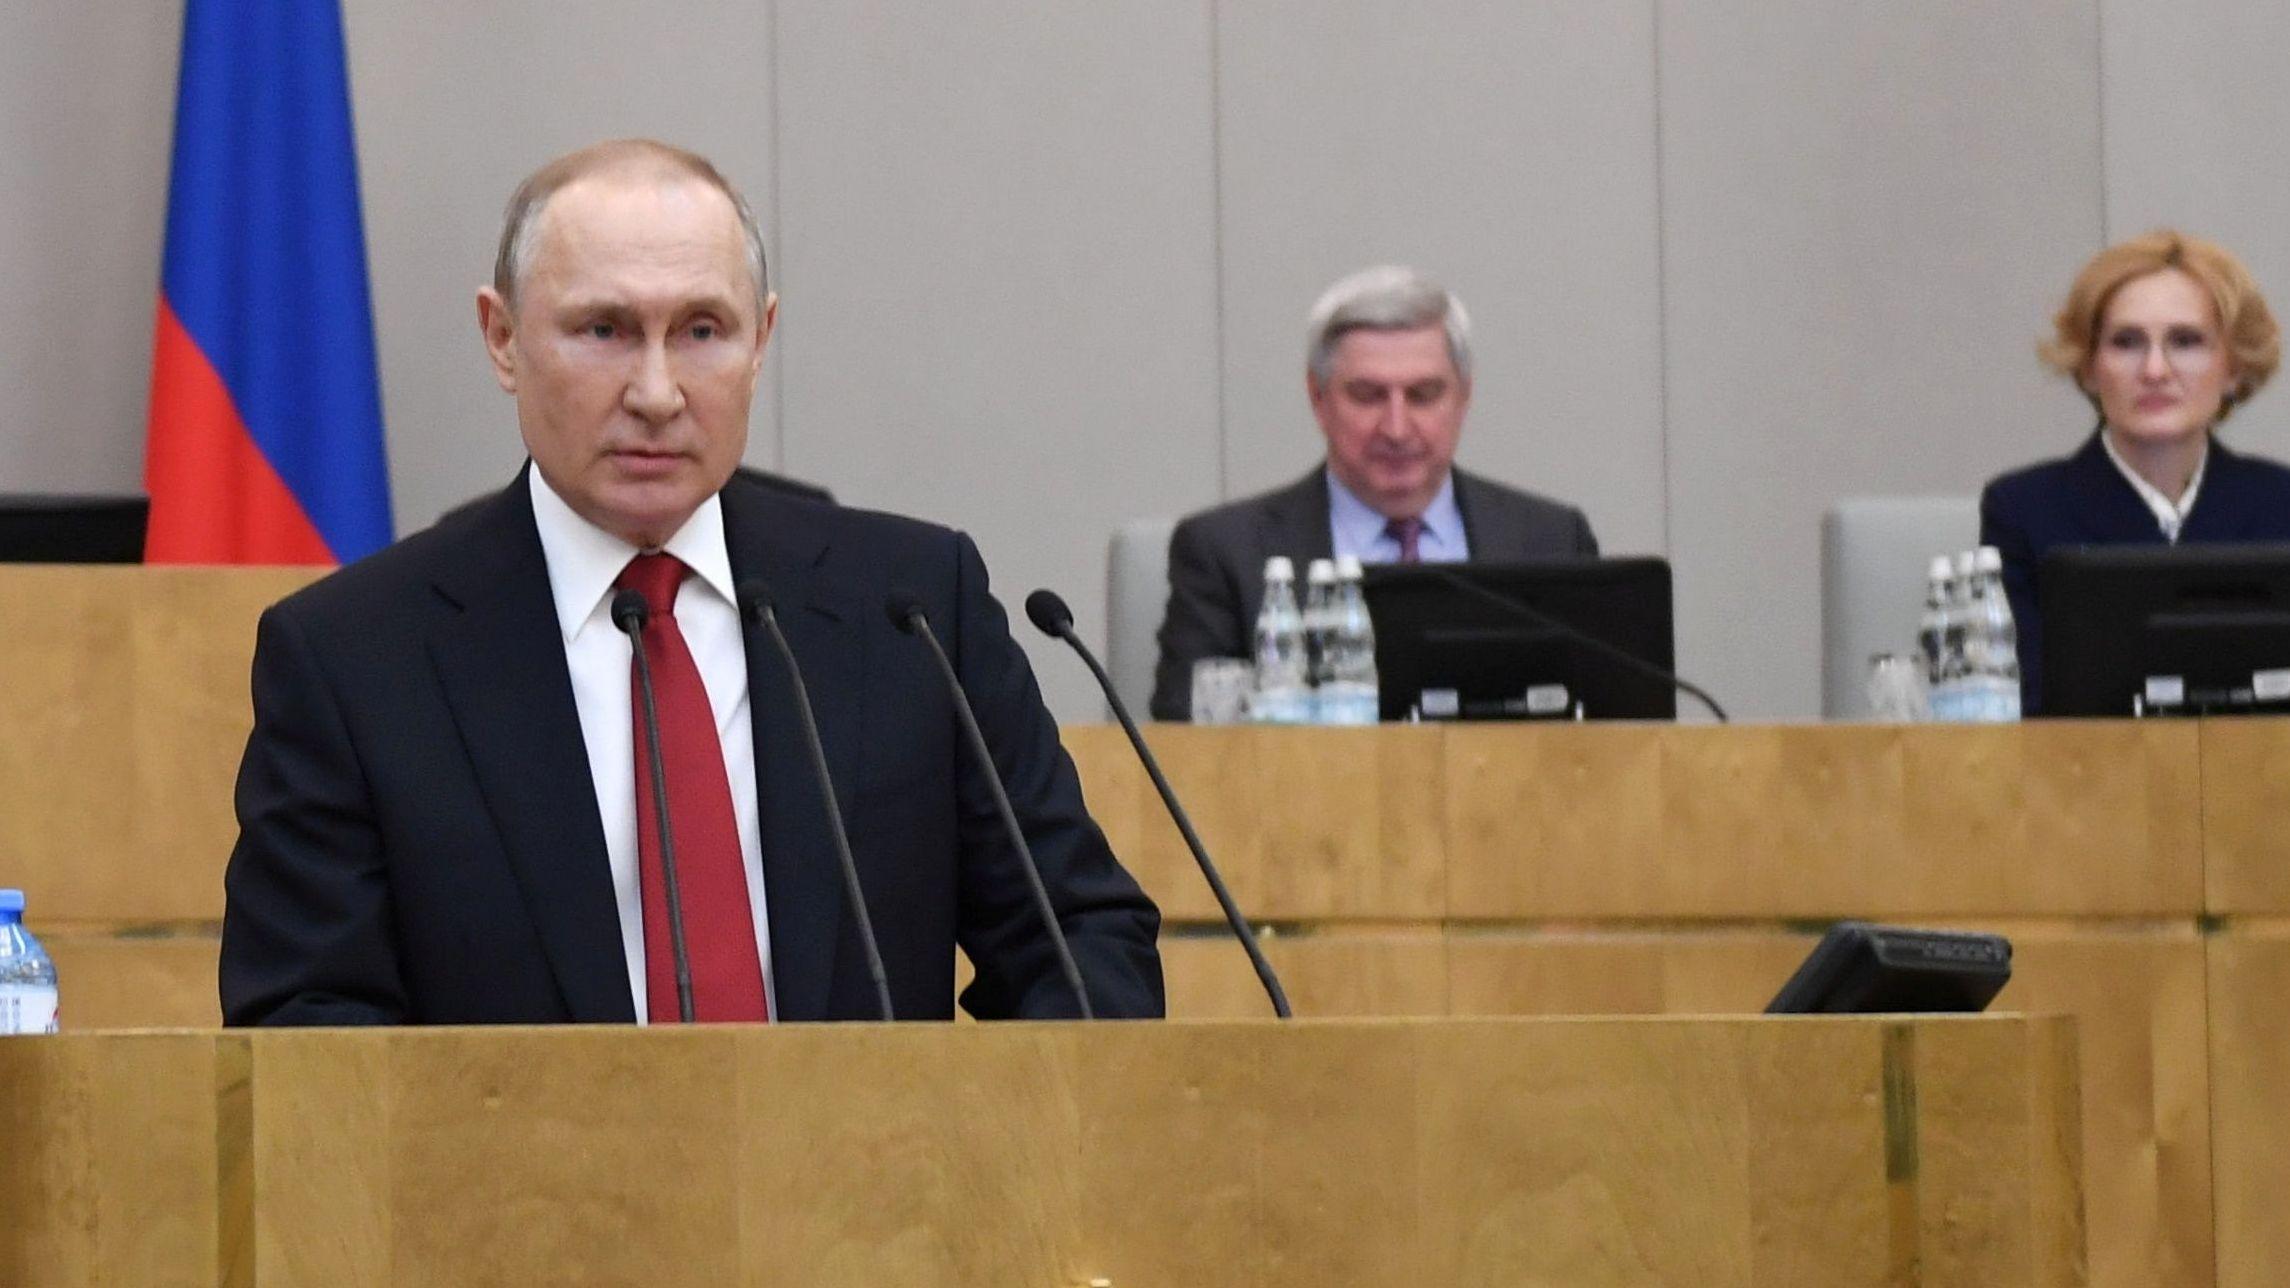 Wladimir Putin in der Duma